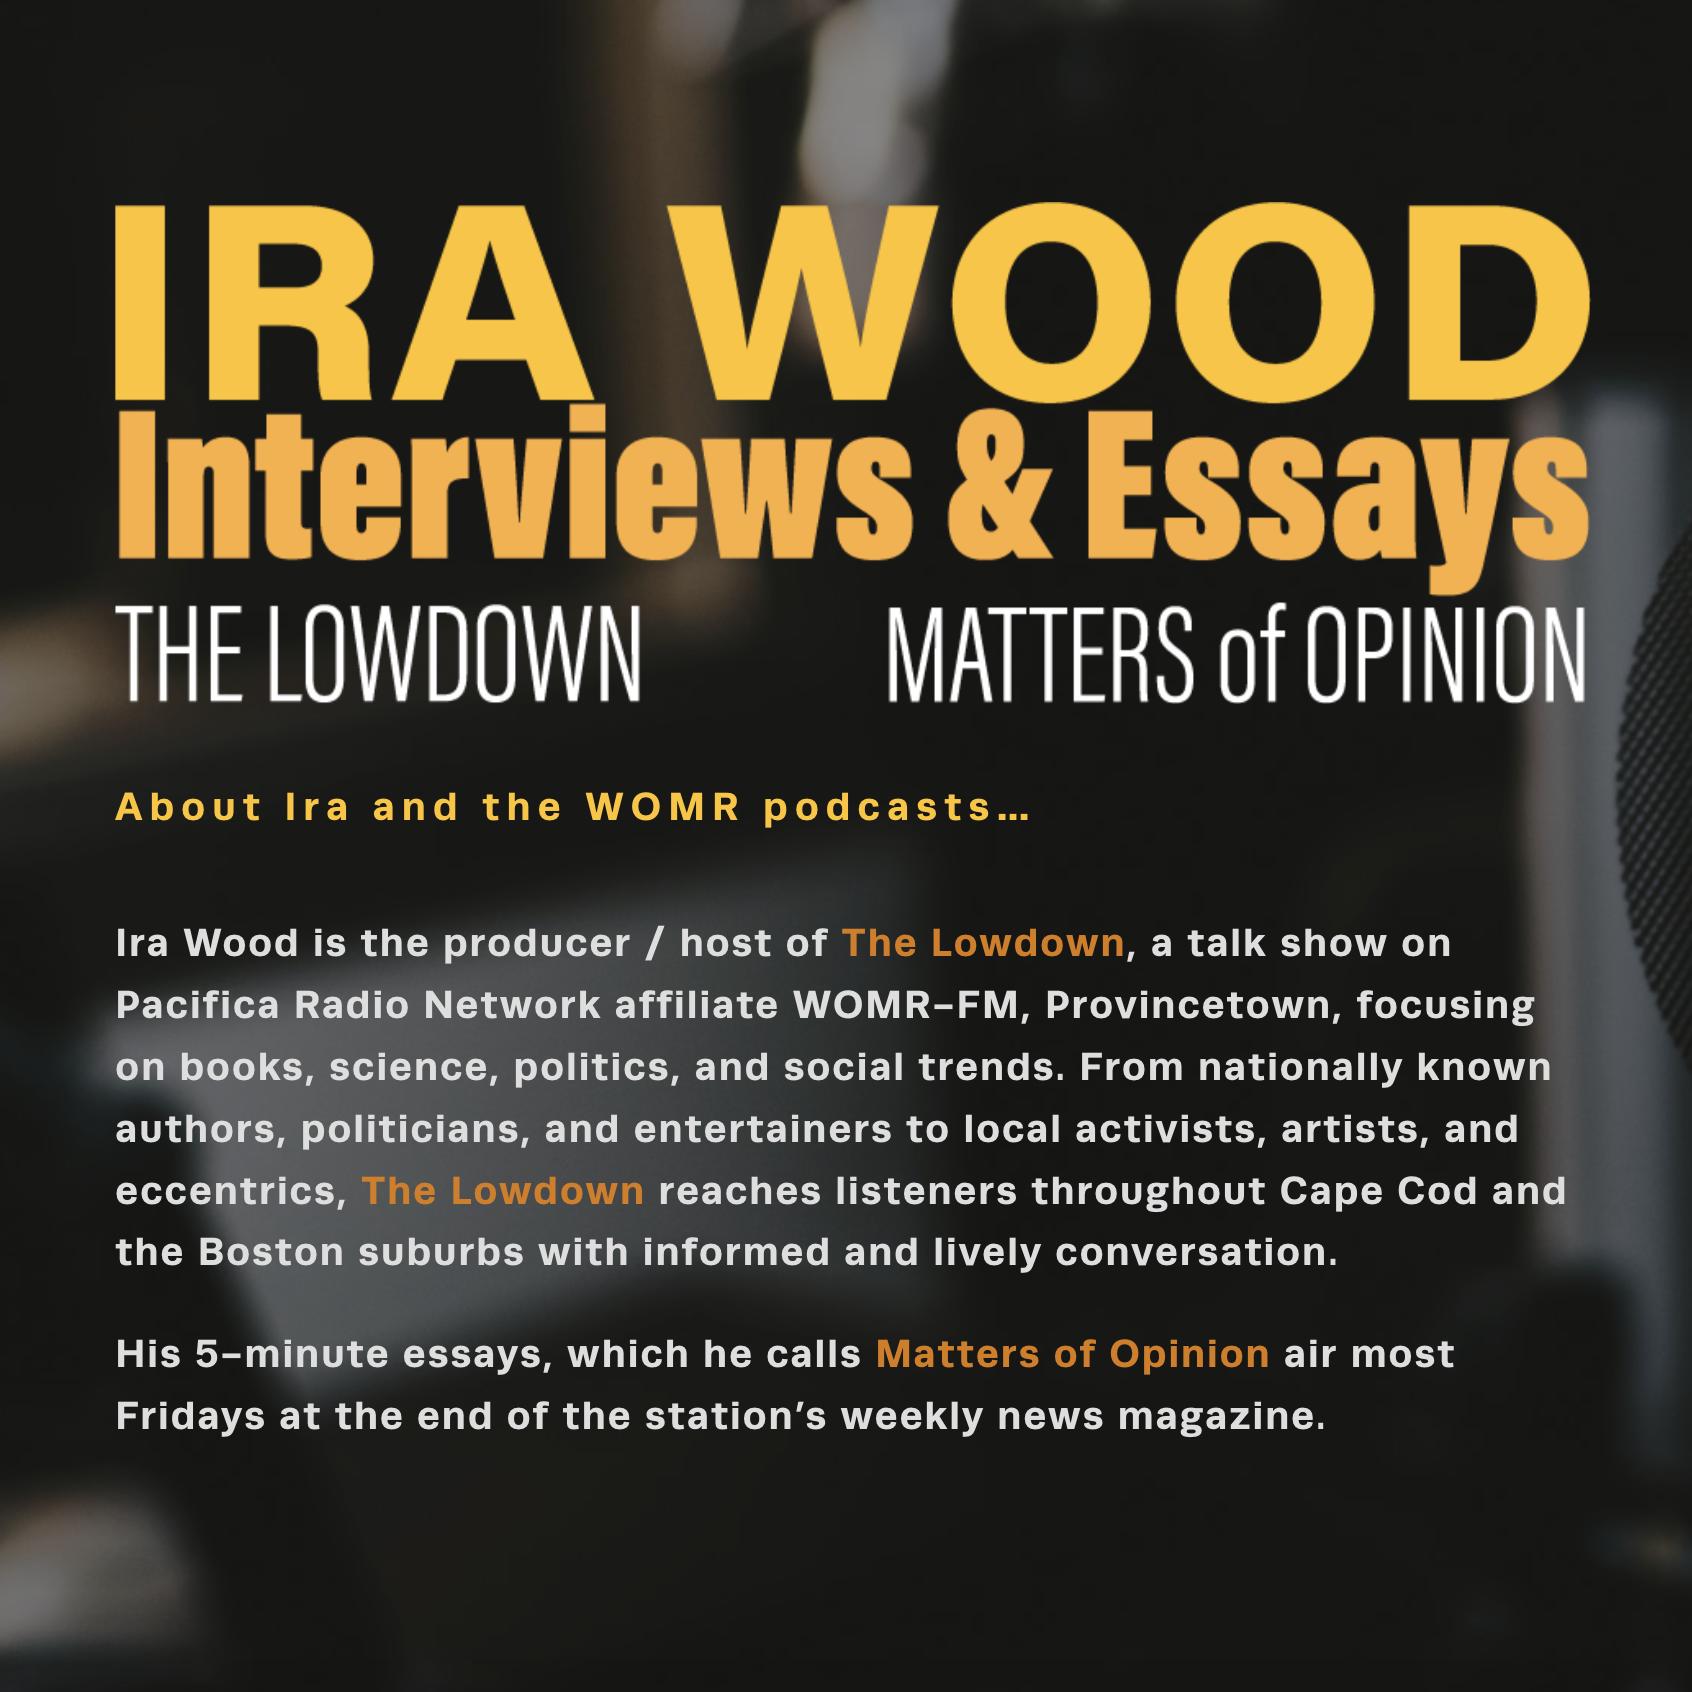 Ira Wood